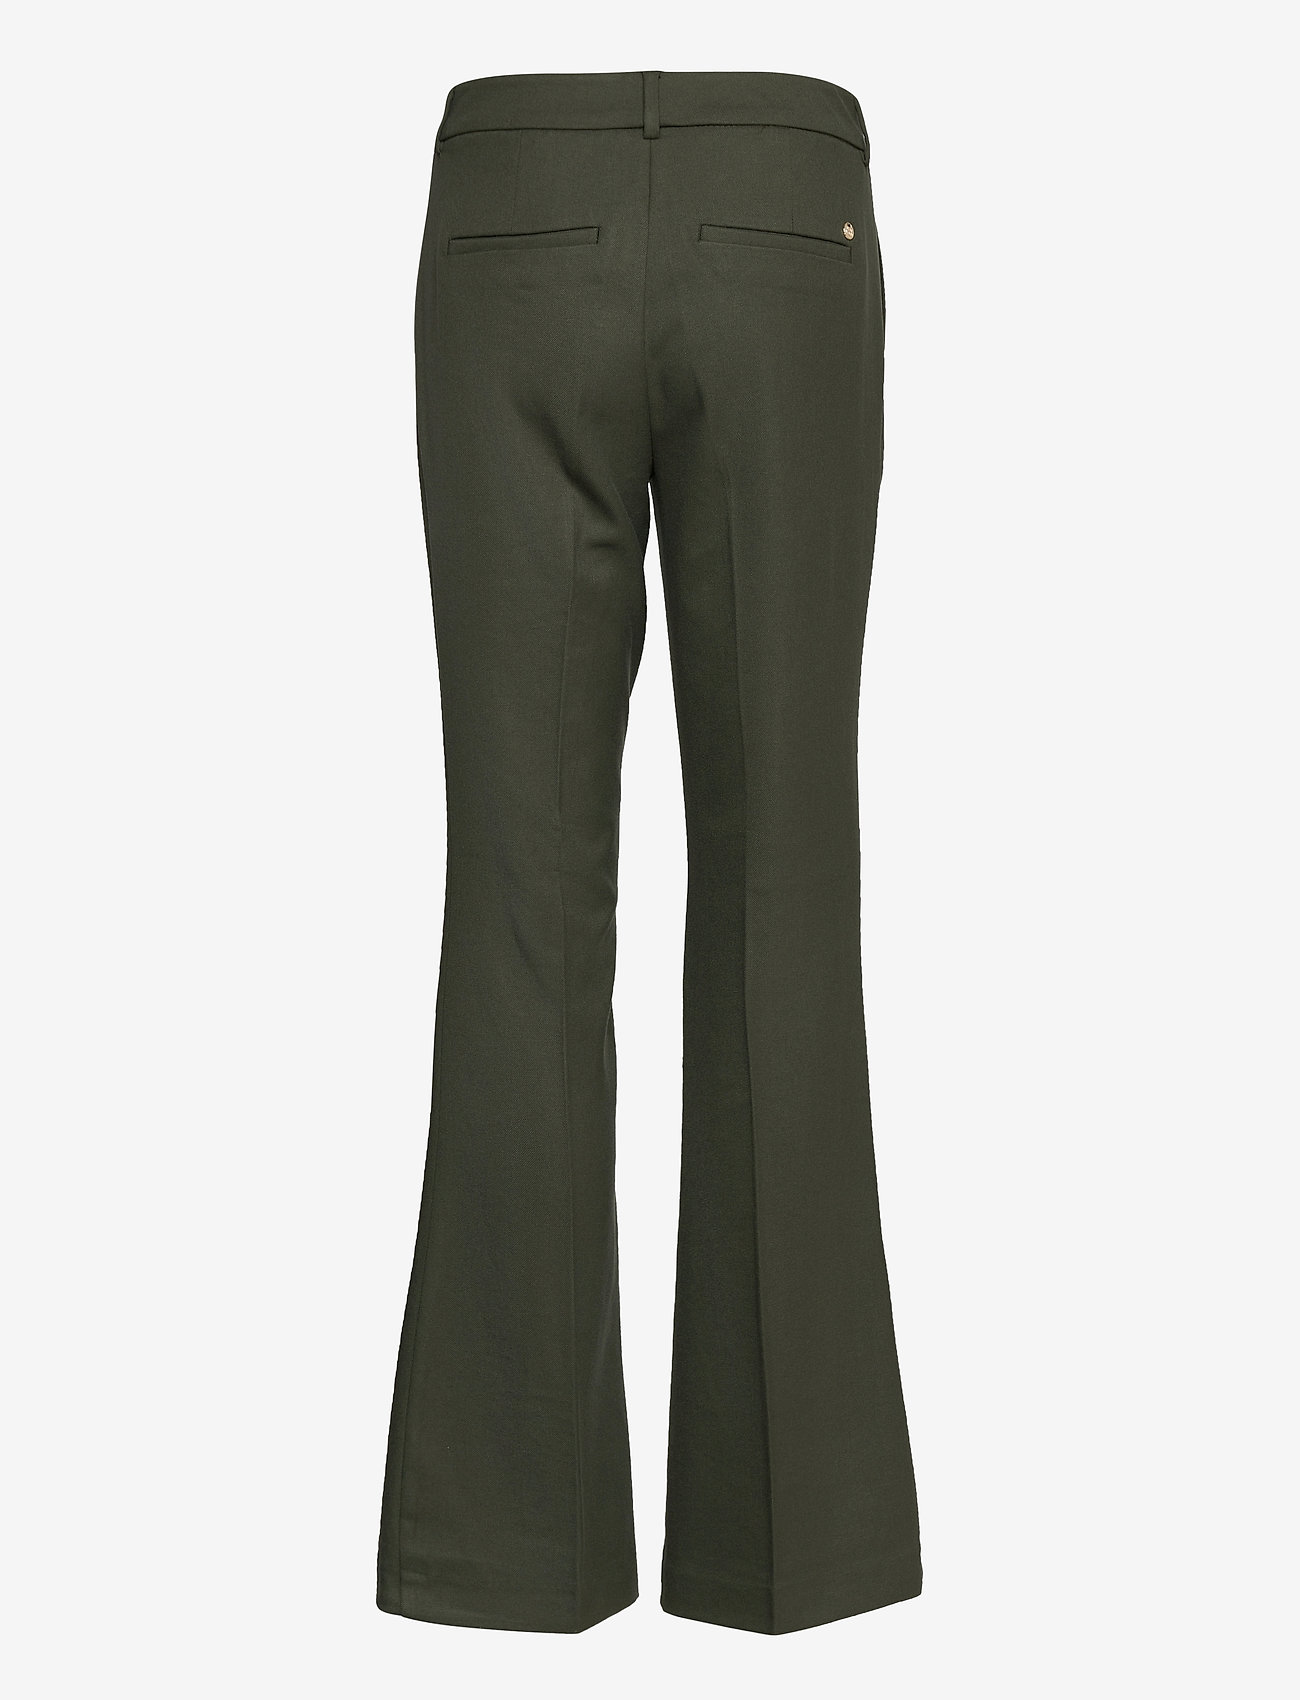 MOS MOSH - Farrah Twiggy Pant Sustainable - schlaghosen - duffel bag - 1